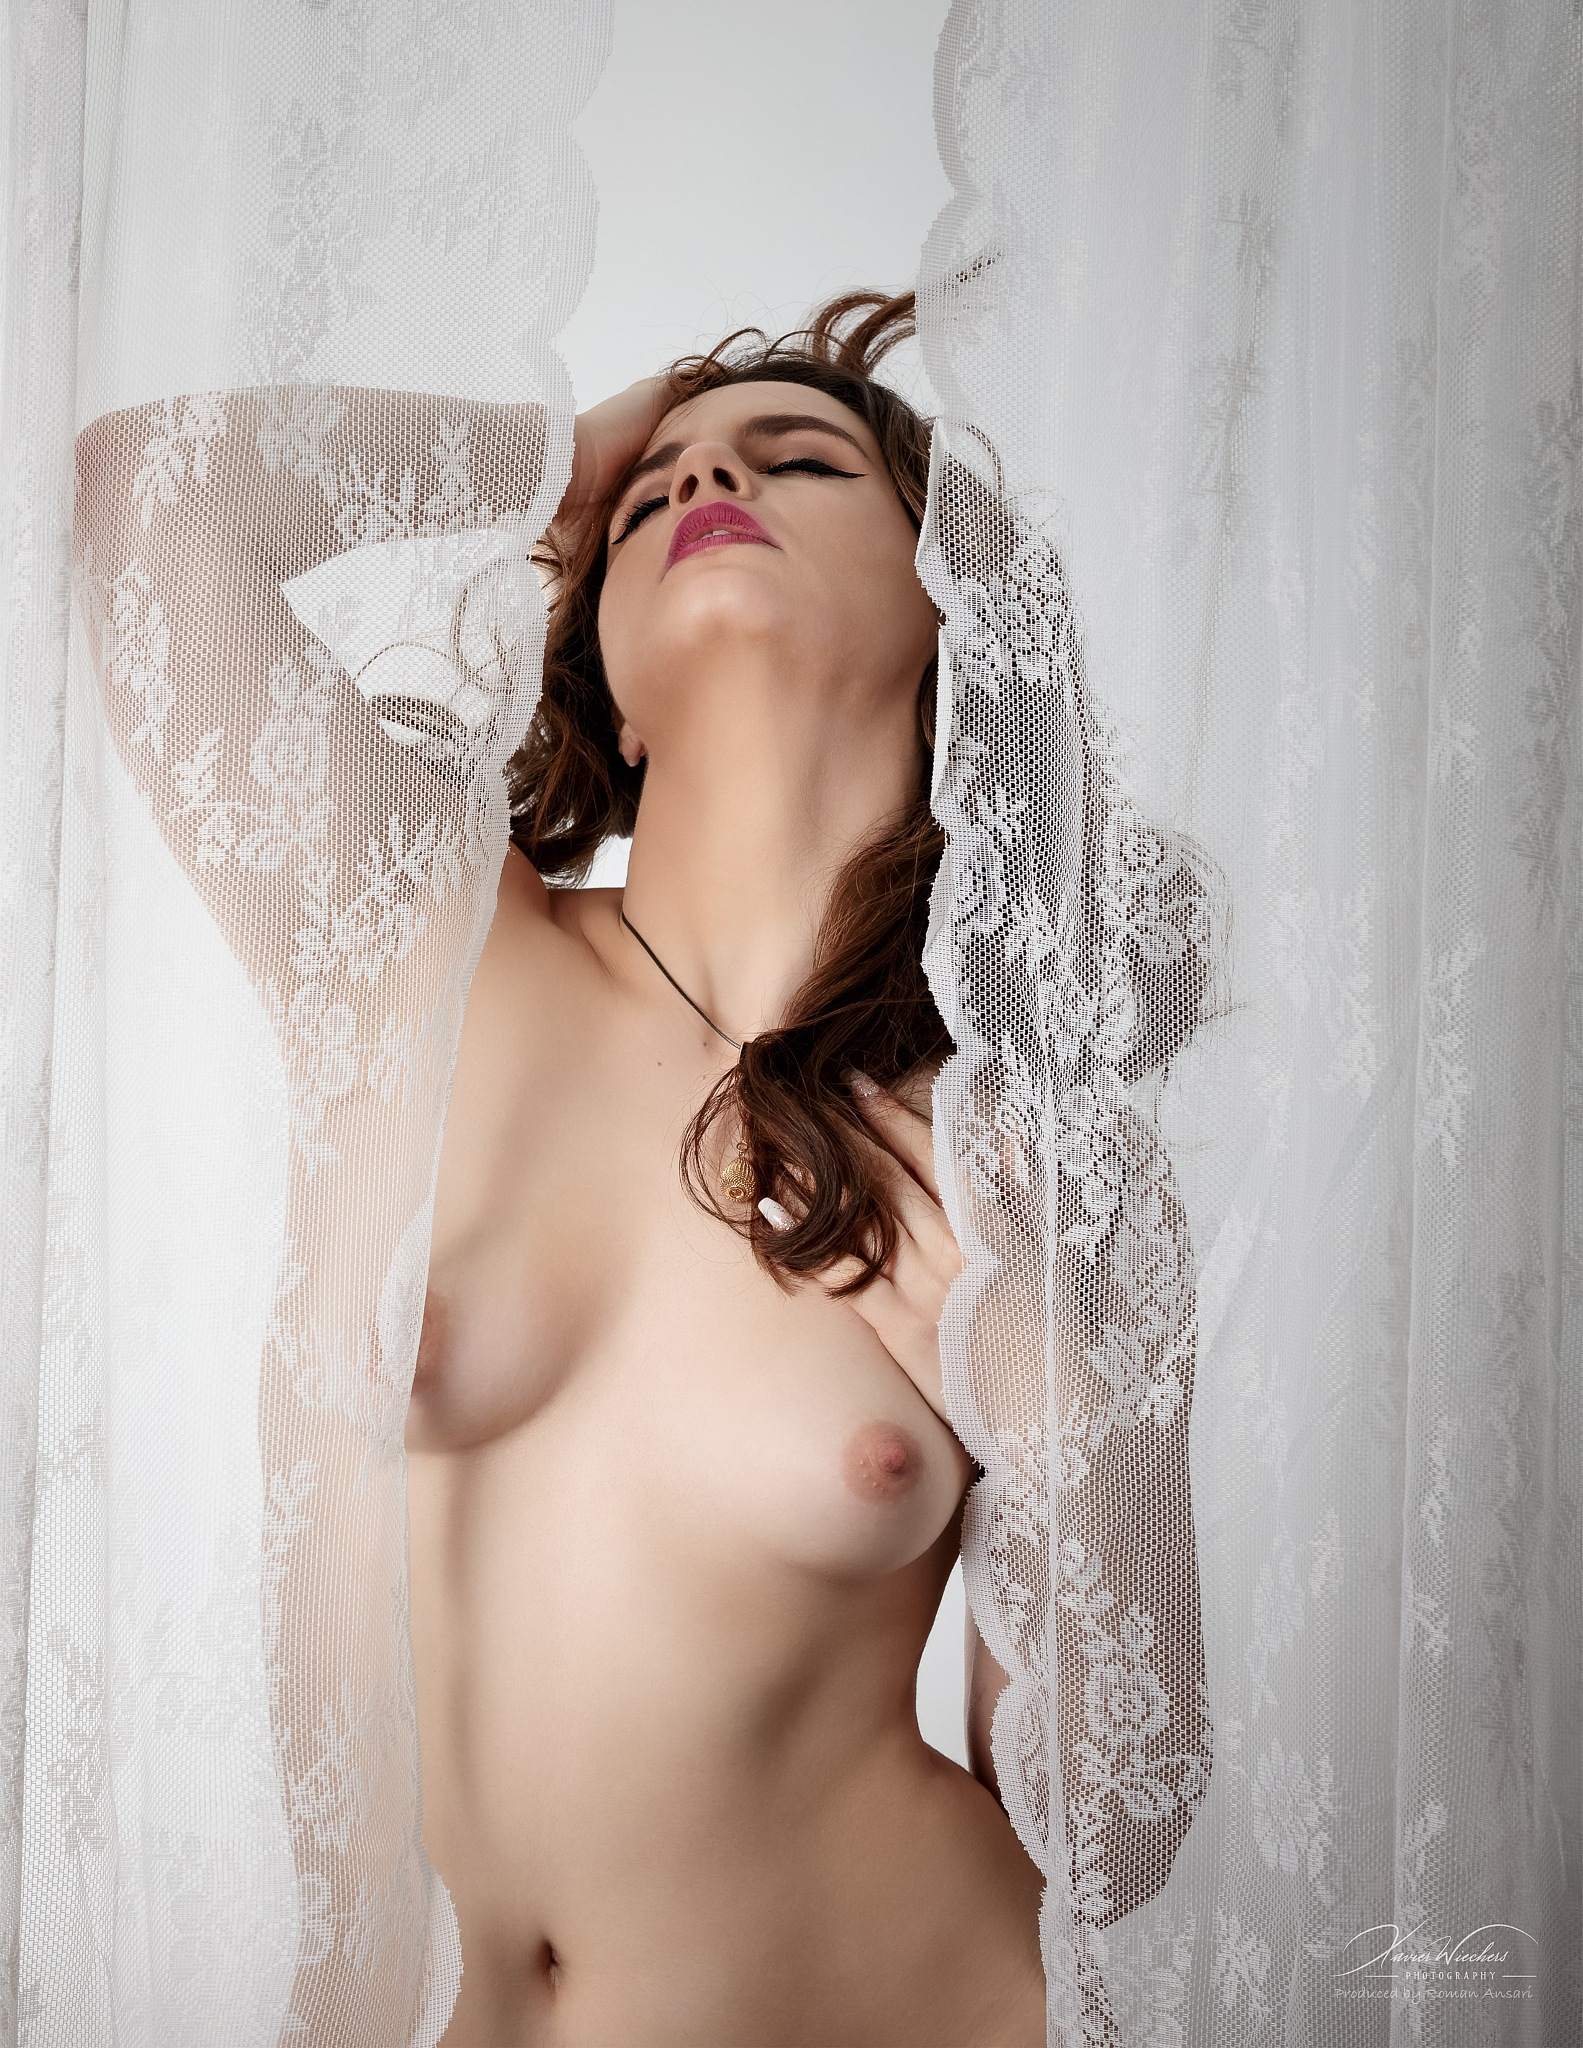 Miranda - Nude 24 by xwiechers